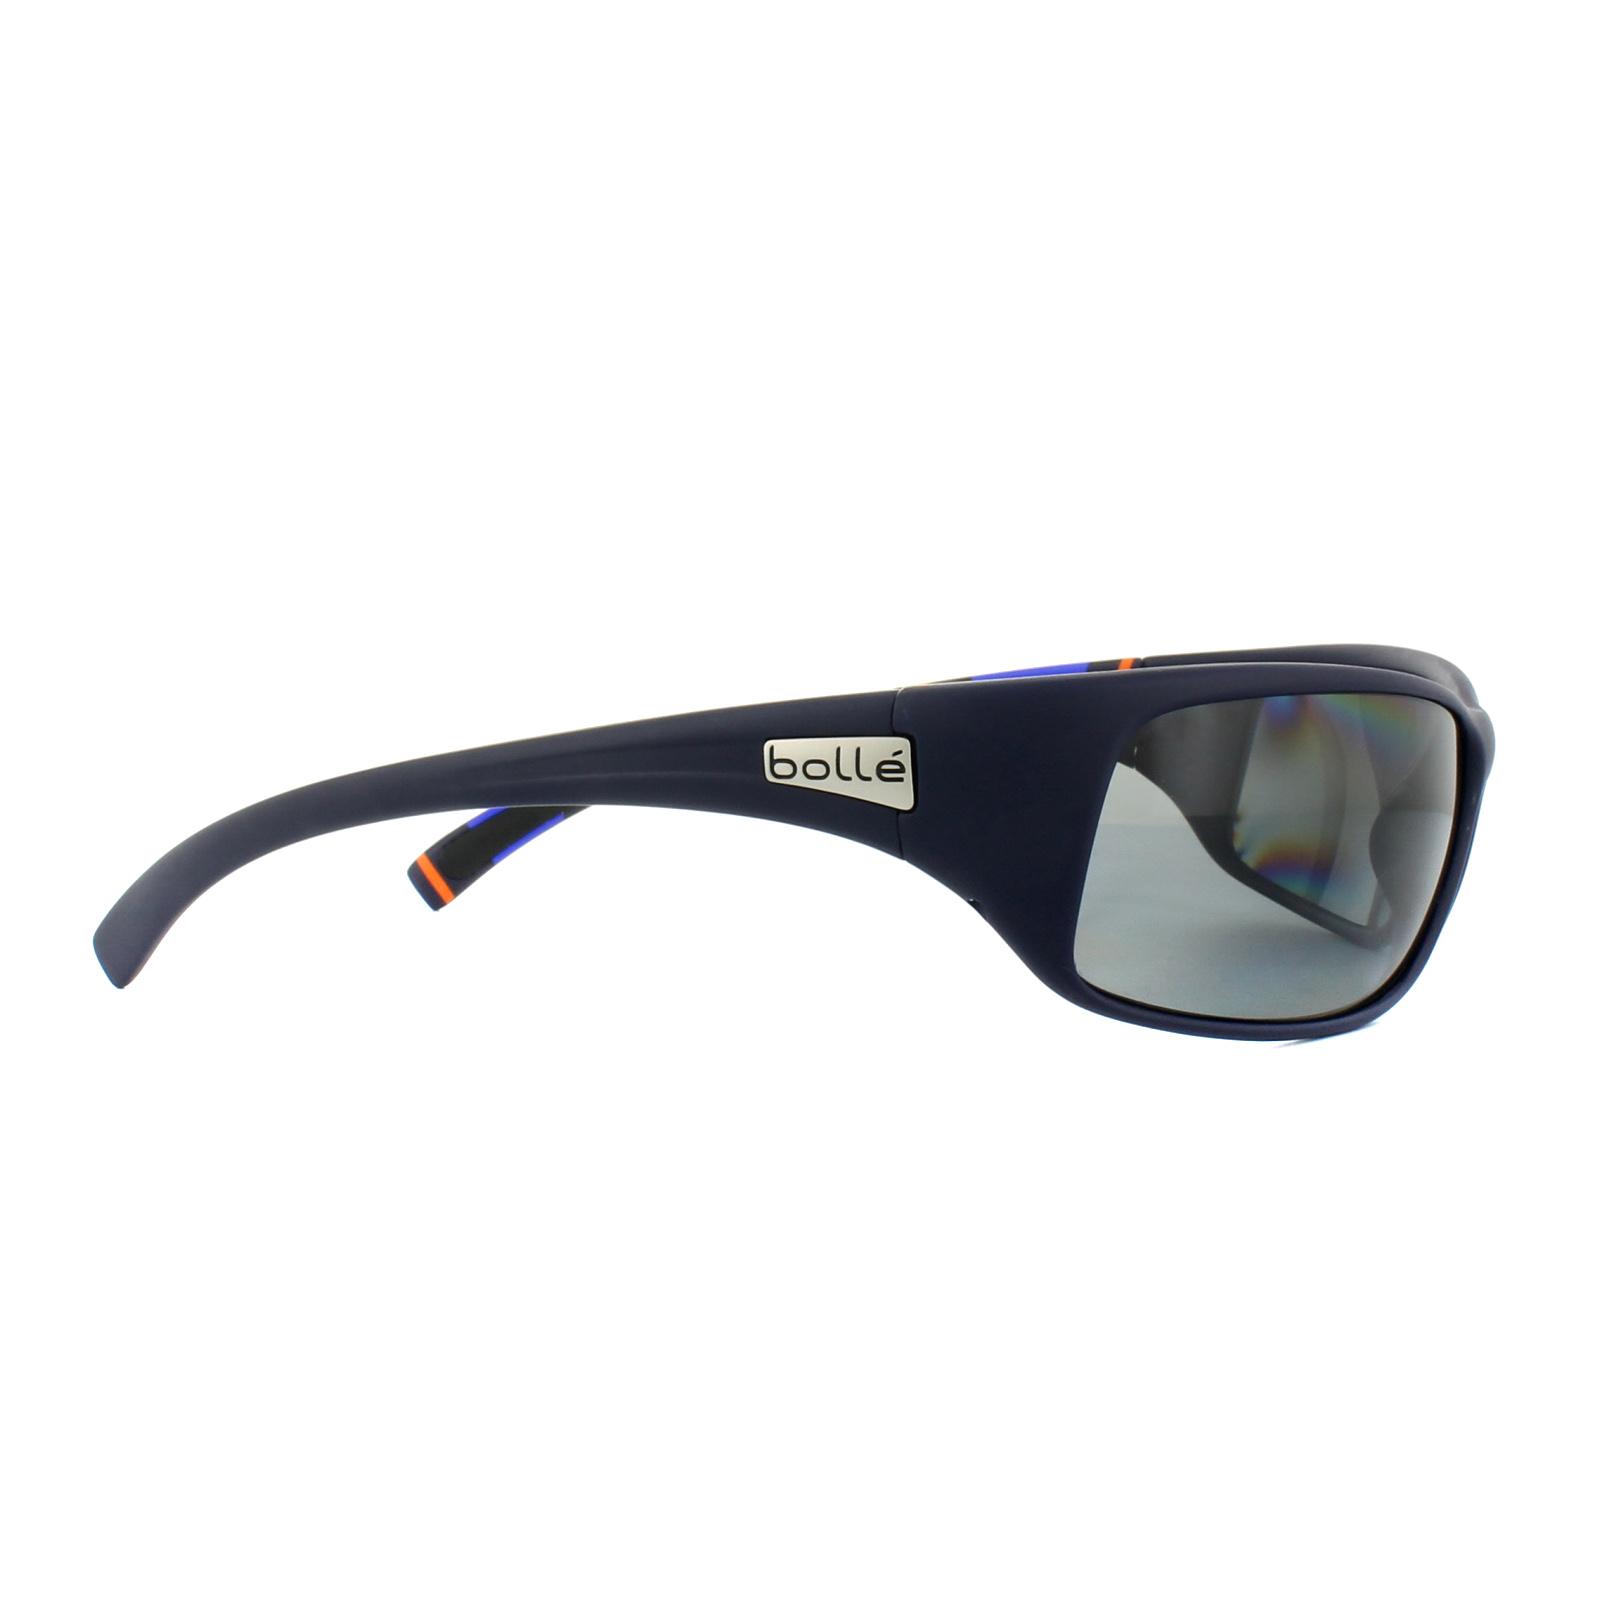 248513a480b Sentinel Bolle Sunglasses Recoil 11966 Matt Blue Stripes Modulator Grey  Polarized